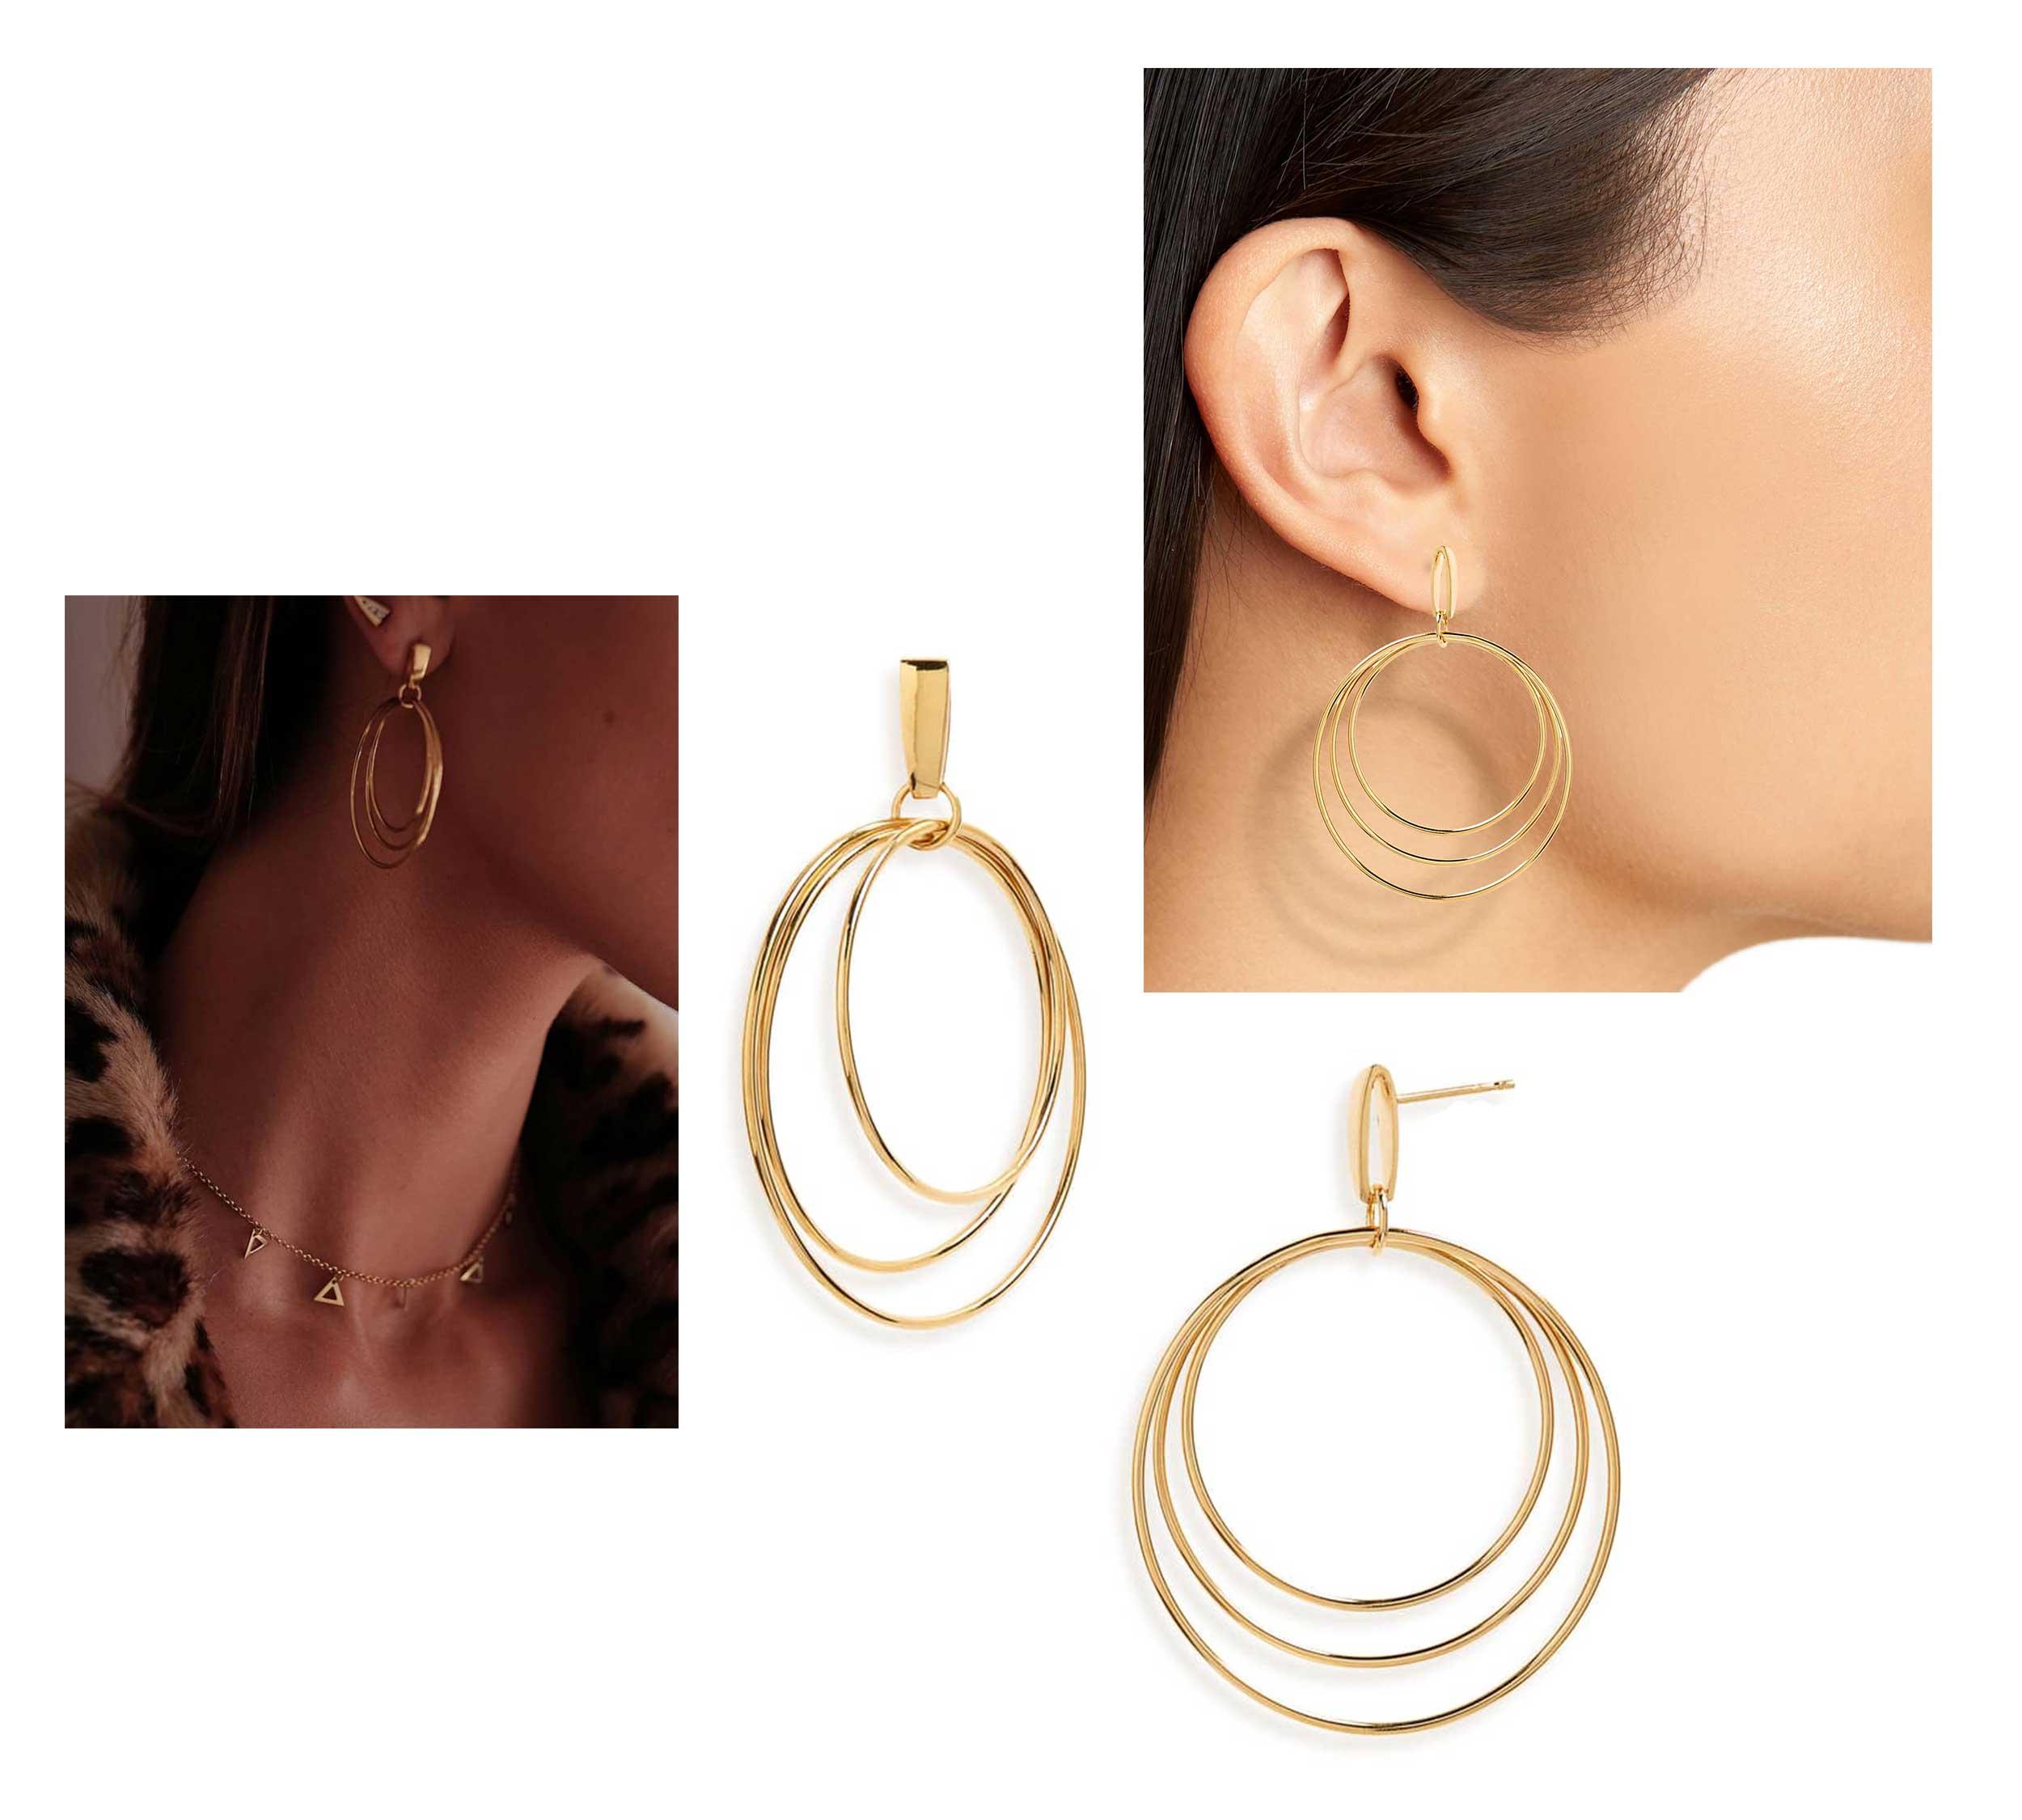 Mini Christy Vermeil Hoop Earrings by Natasha Schweitzer, Runway Jewelry Trends 2019